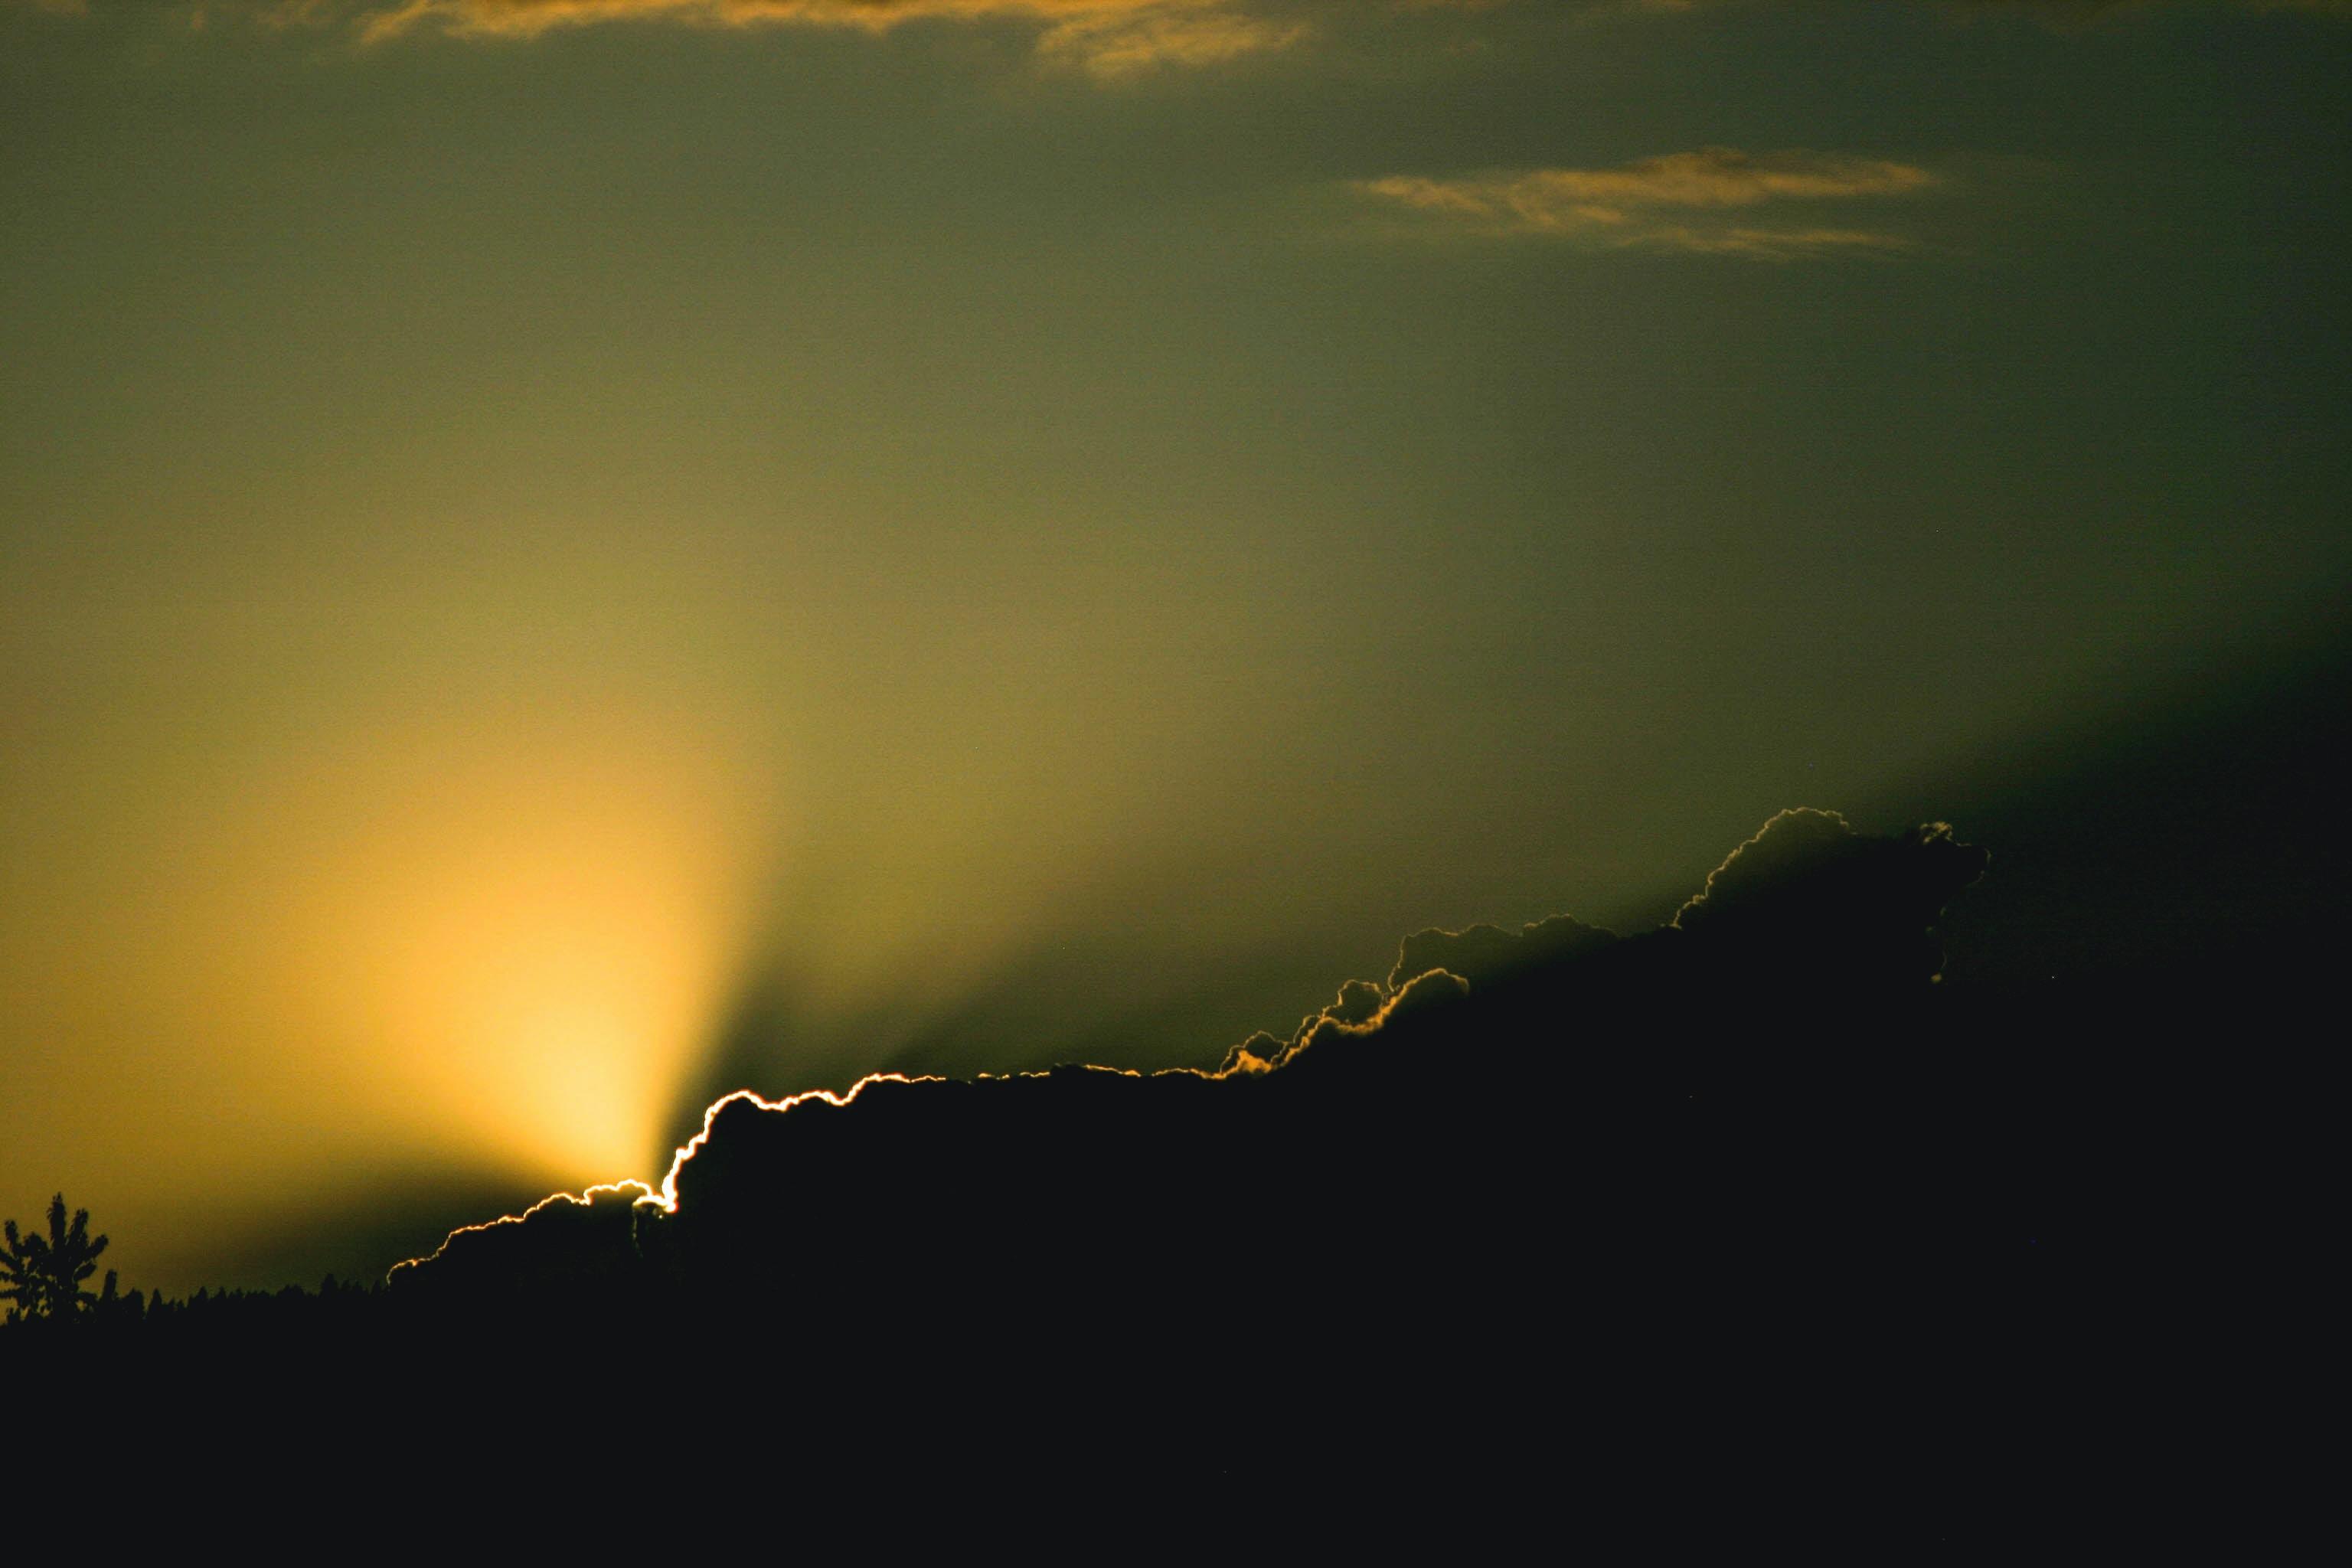 sunshine through clouds during sunset